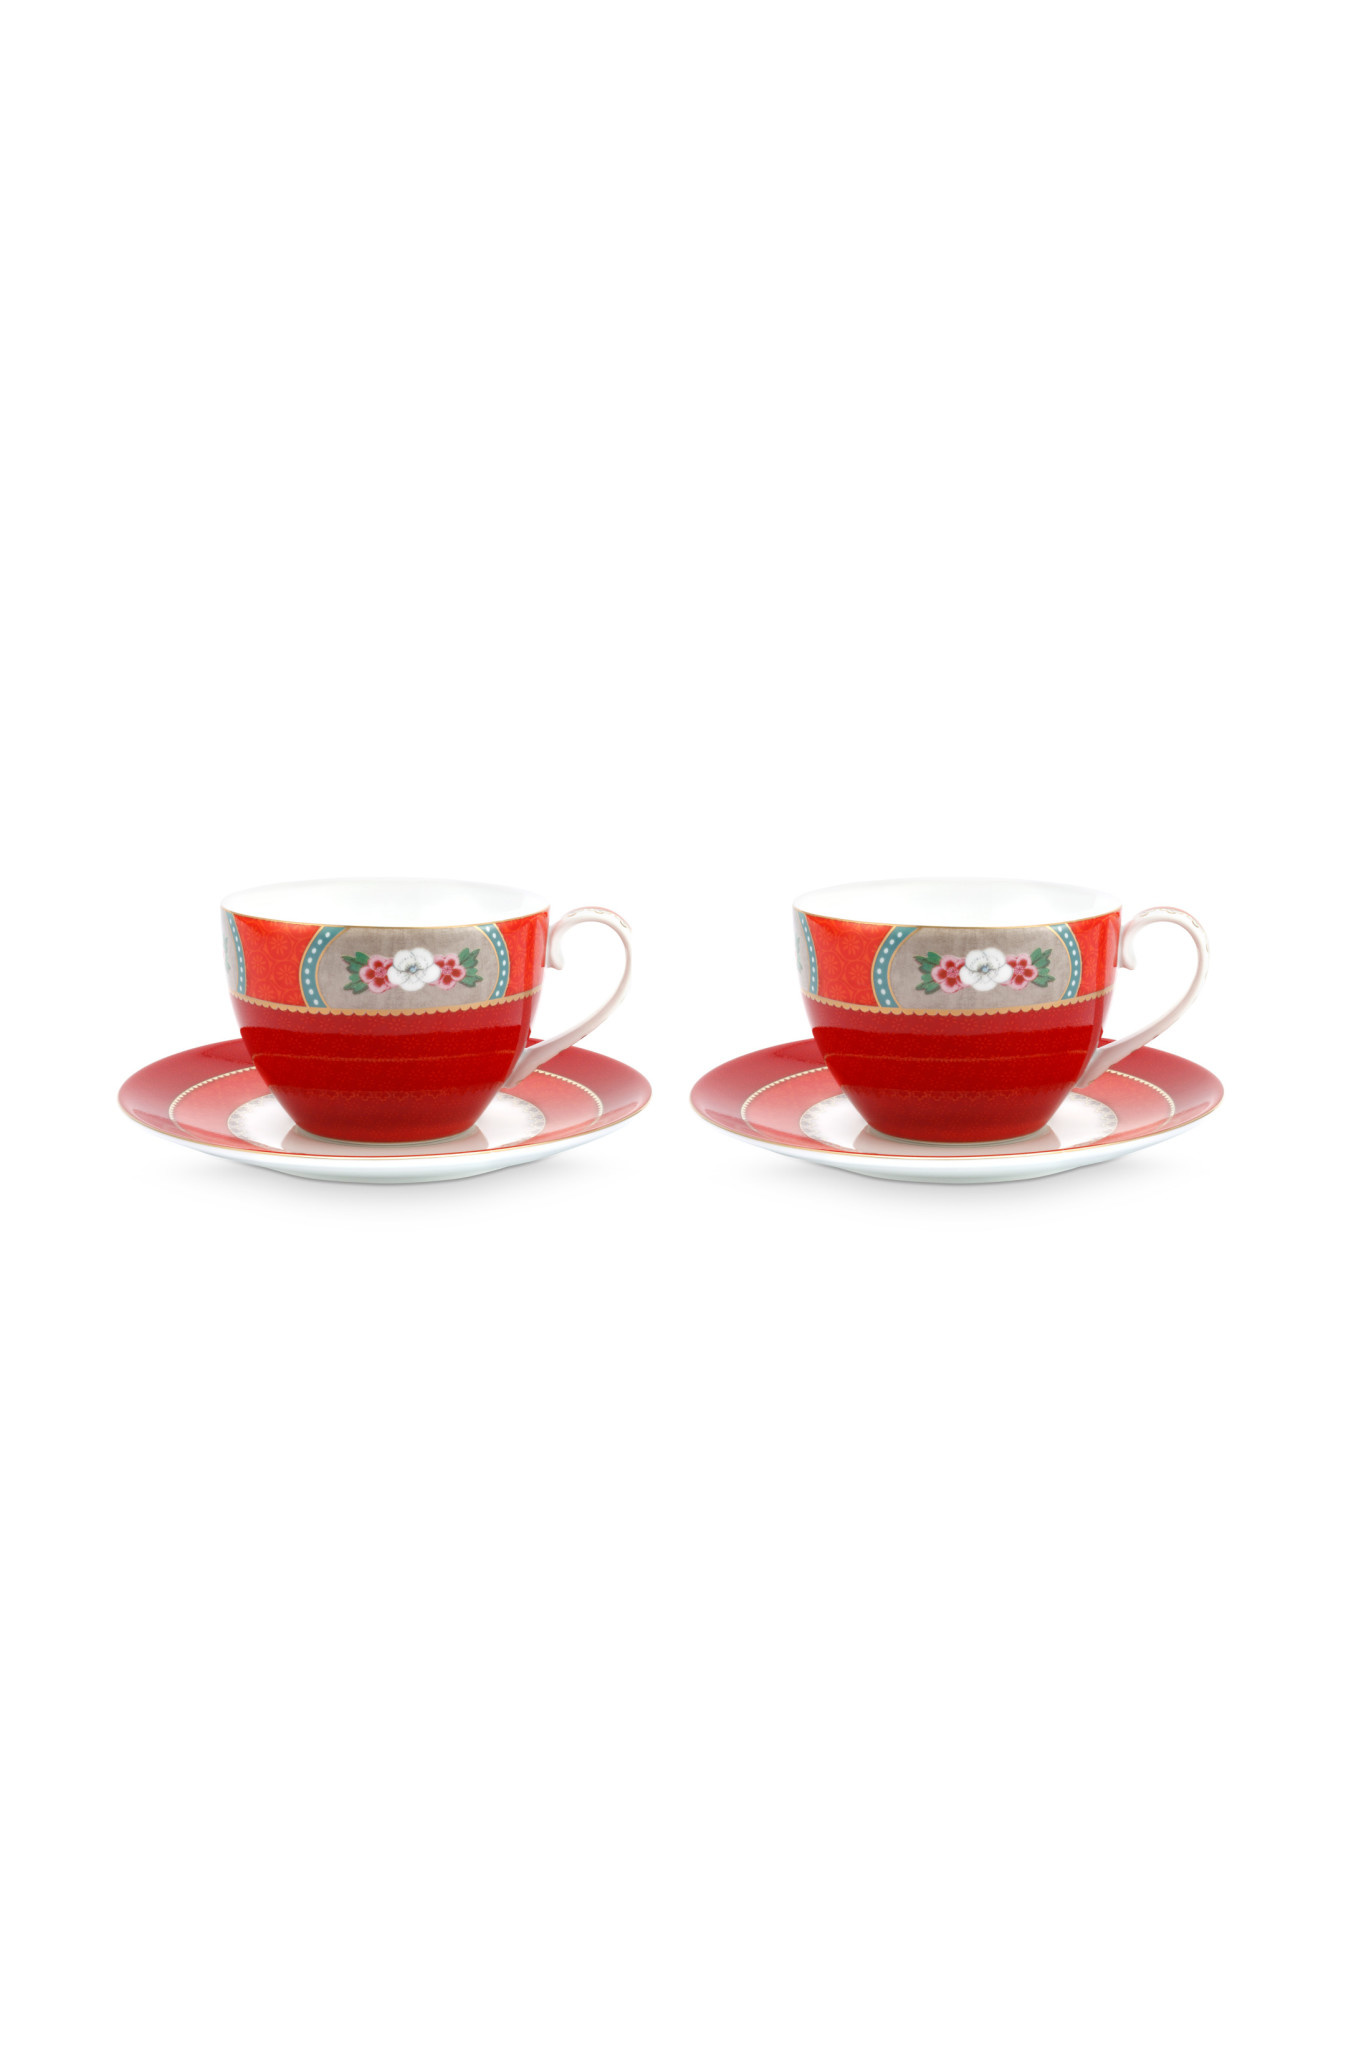 Pip Studio Cup & Saucer Blushing Birds Red 280ml